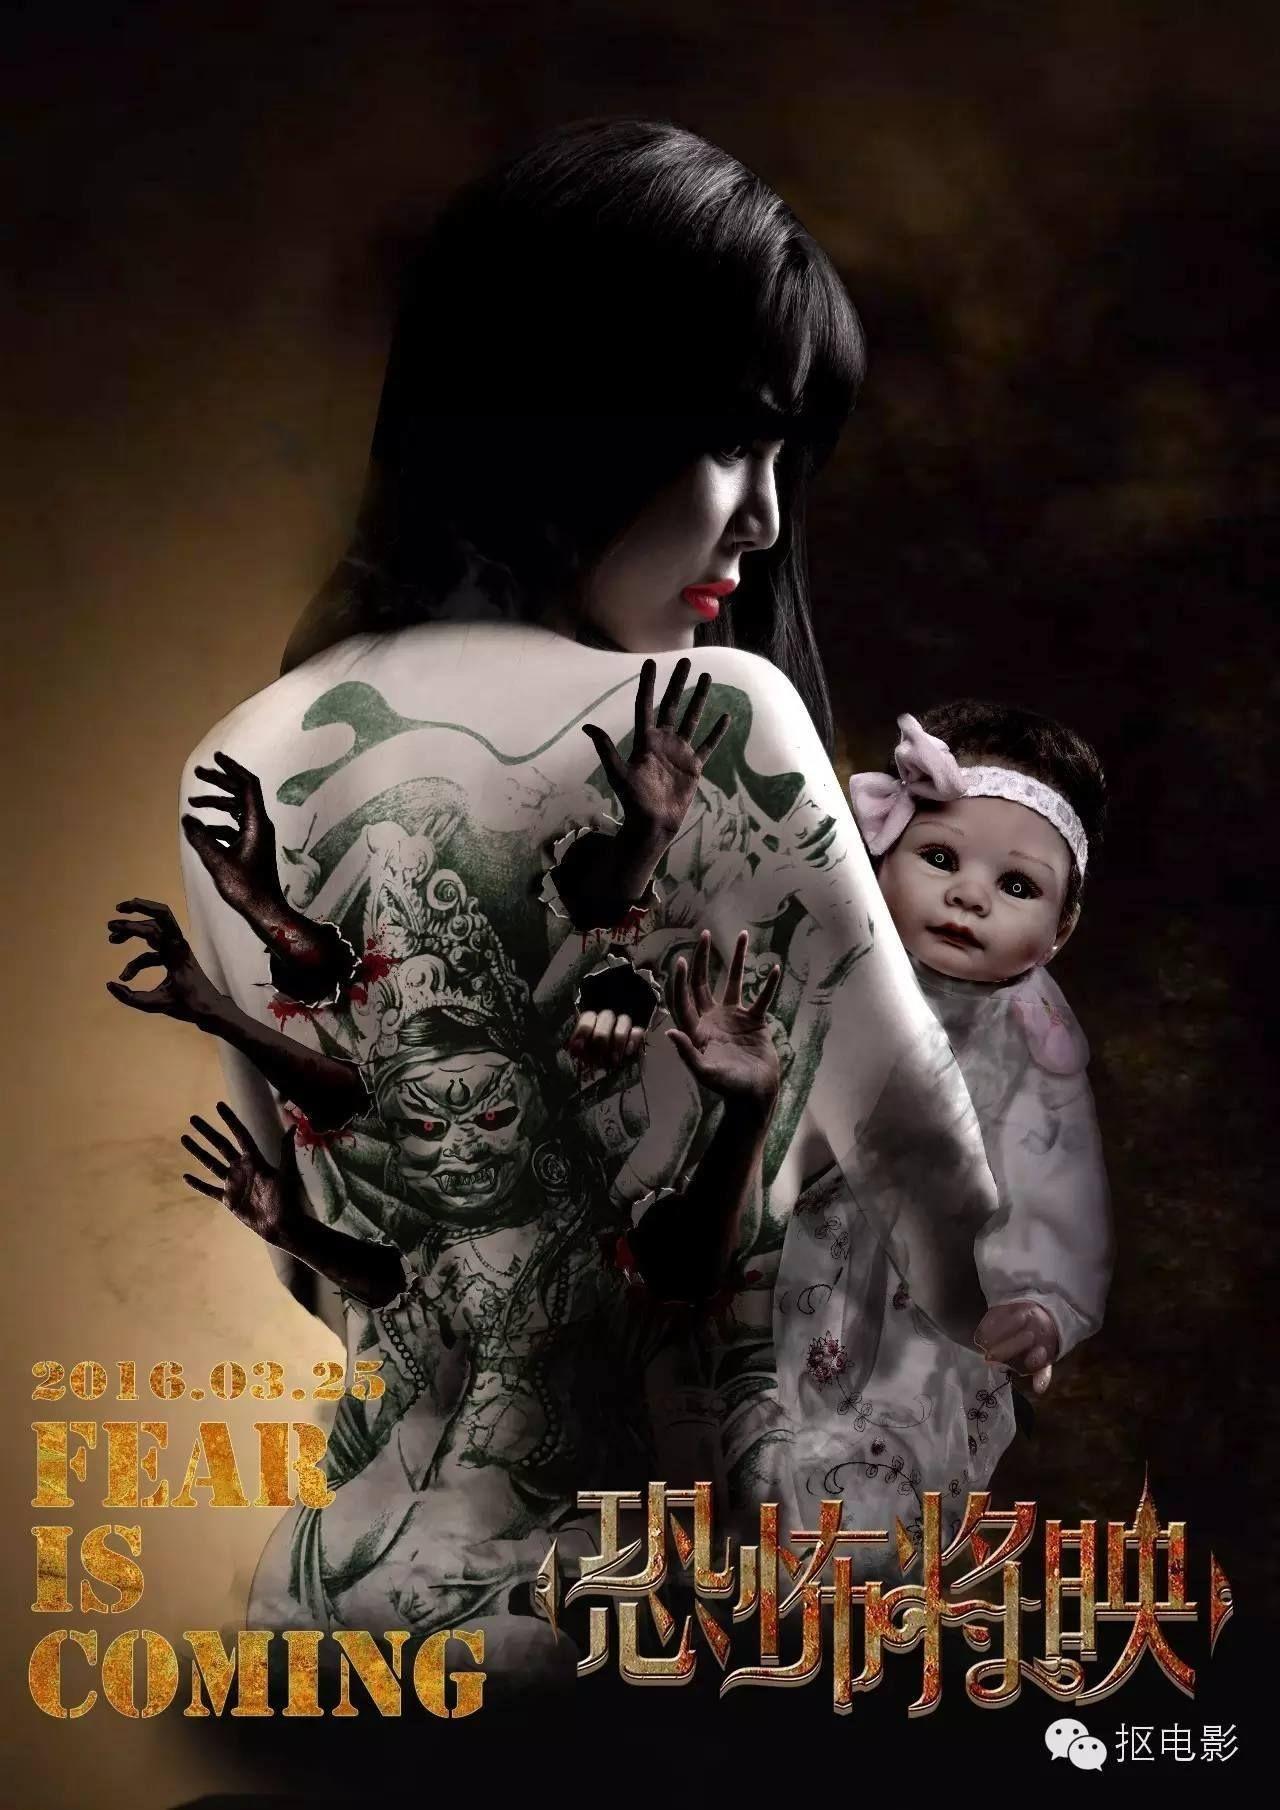 Nonton Film Bioskop Online ( drama korea horor action